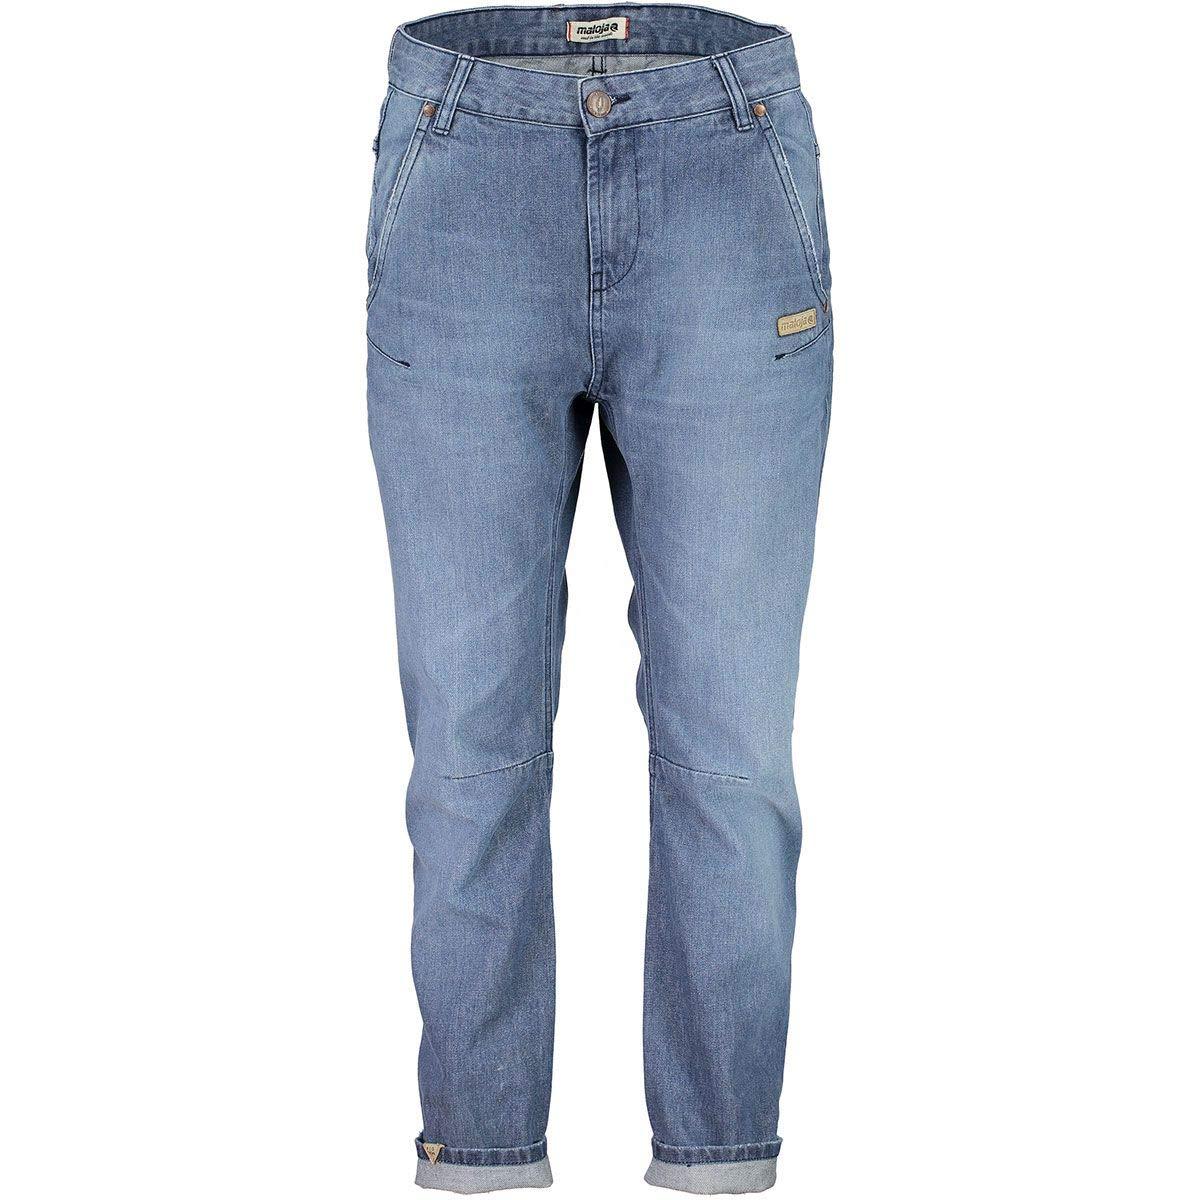 Bleu (mountain lake) 33-34 Maloja marbellam. Pantalons, Femmes